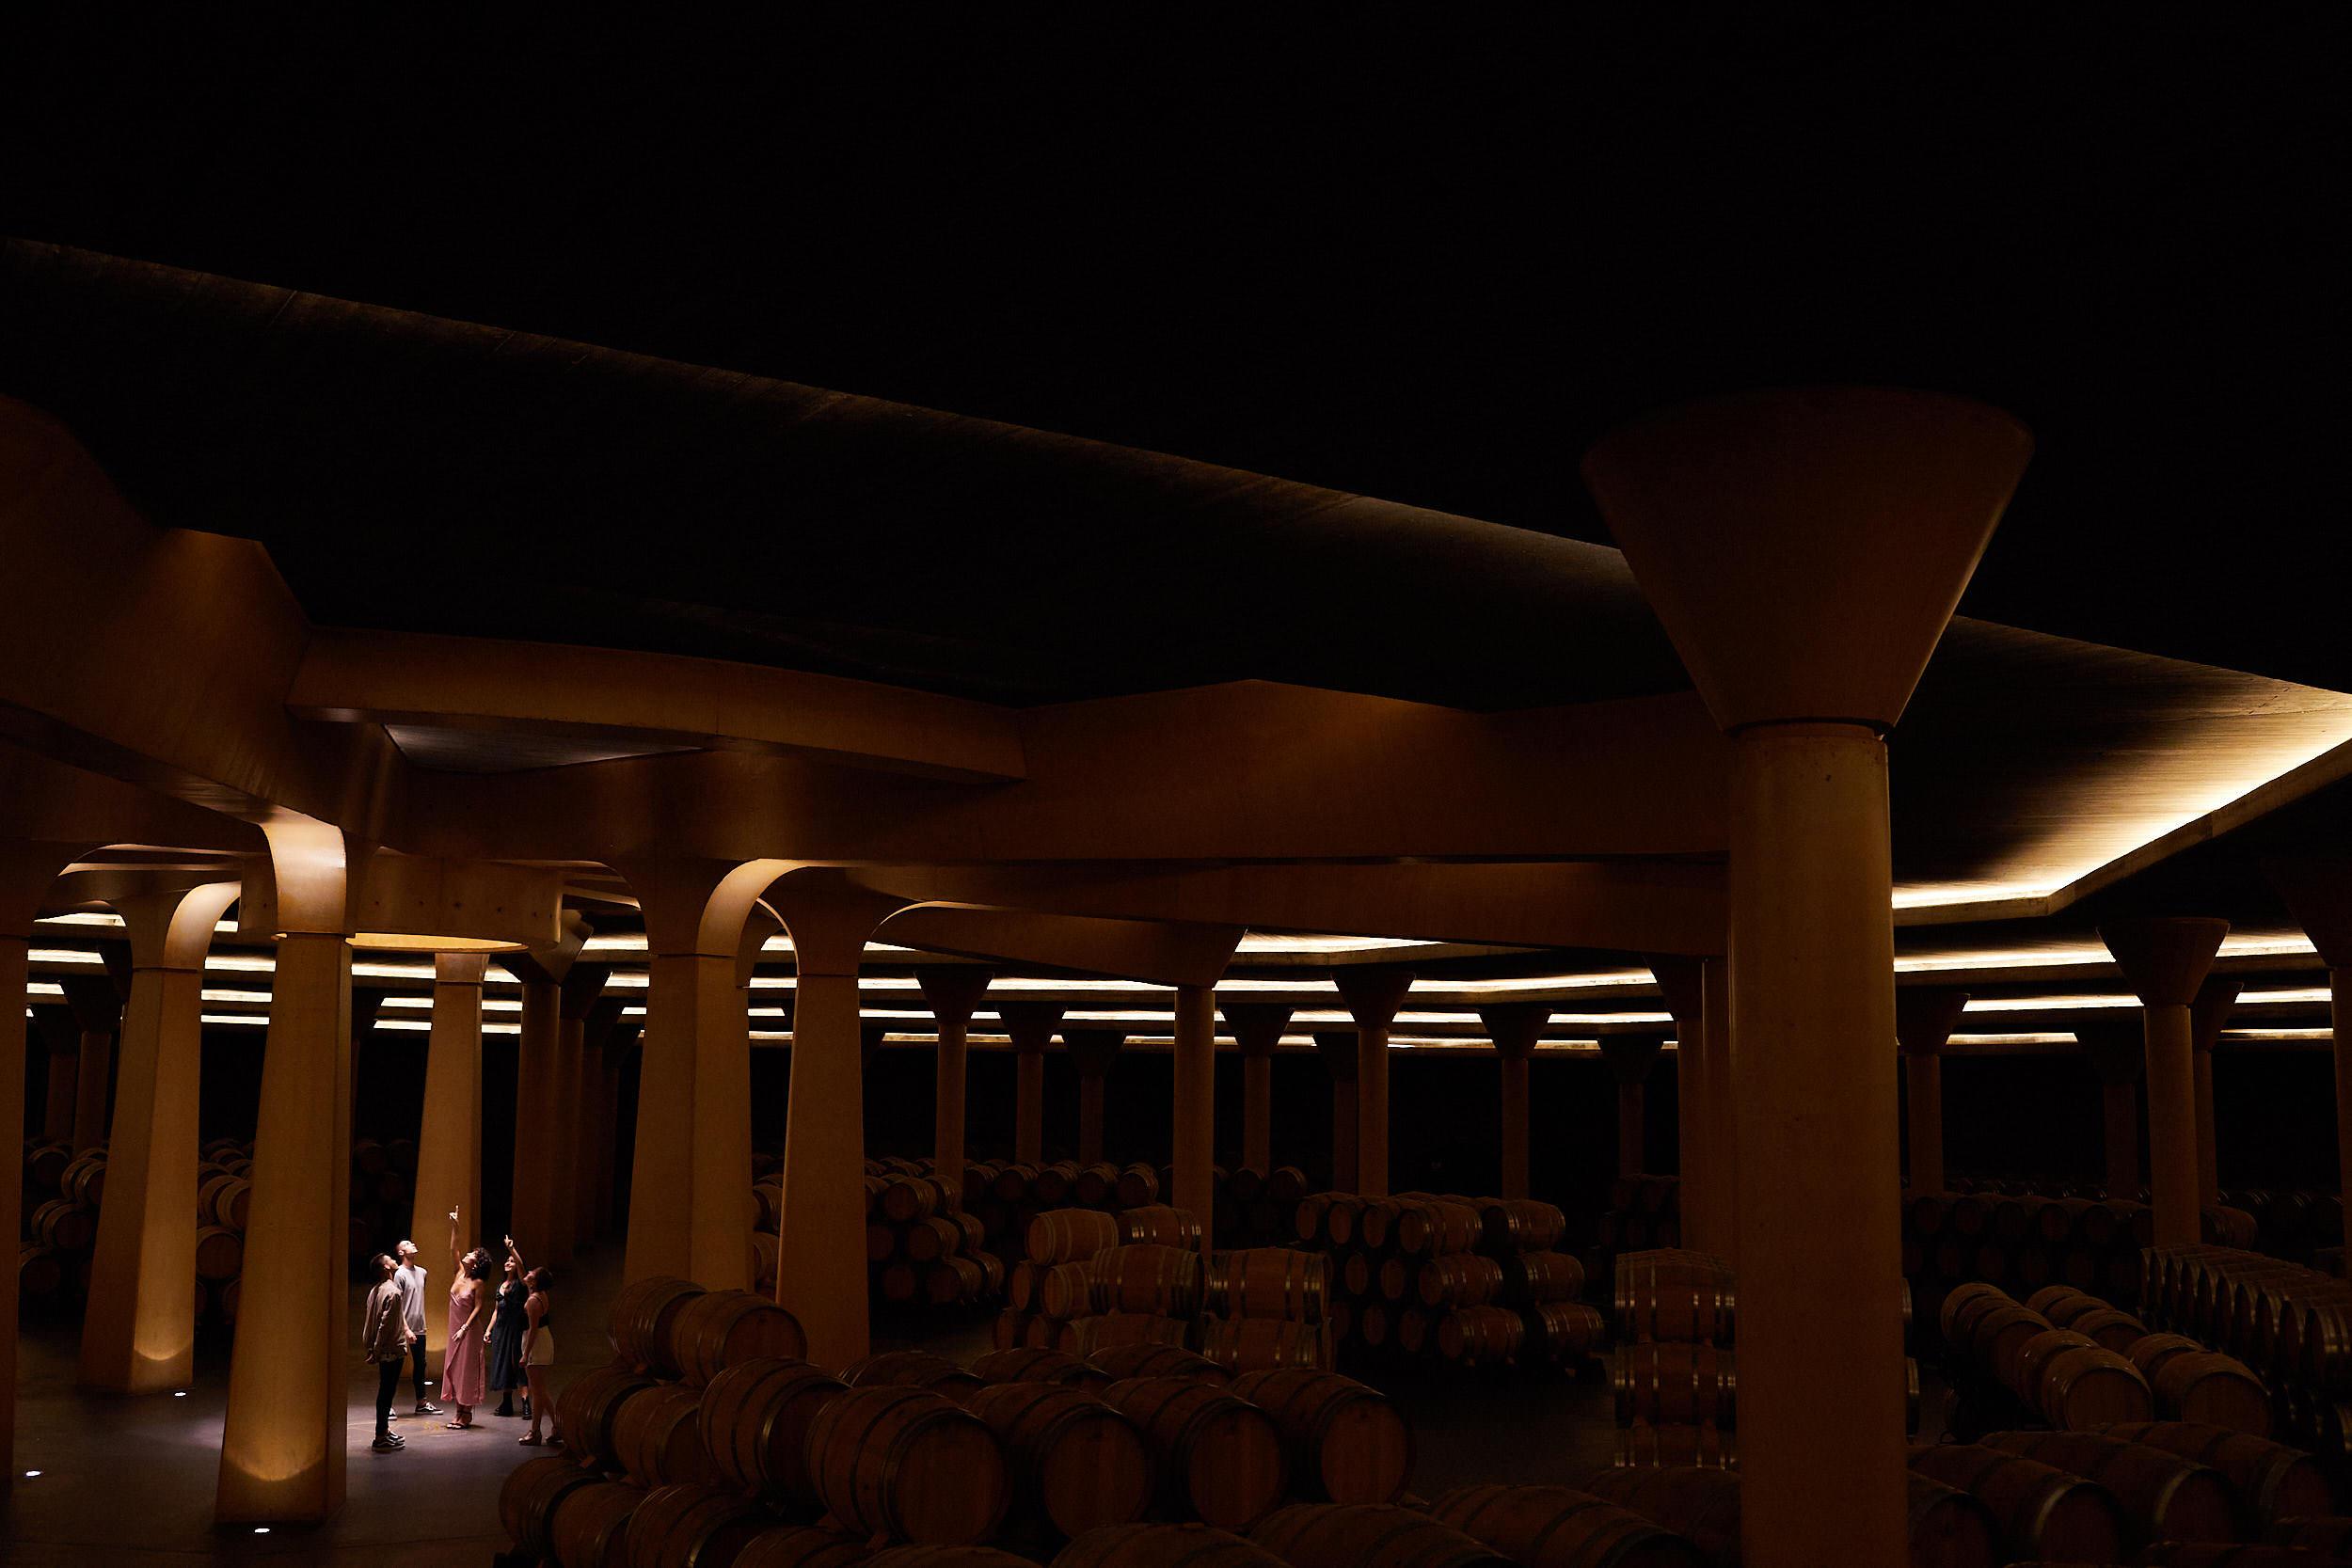 1806fotografia-profesional-corporativa-vino-rioja-espana-James-Sturcke_0033.jpg